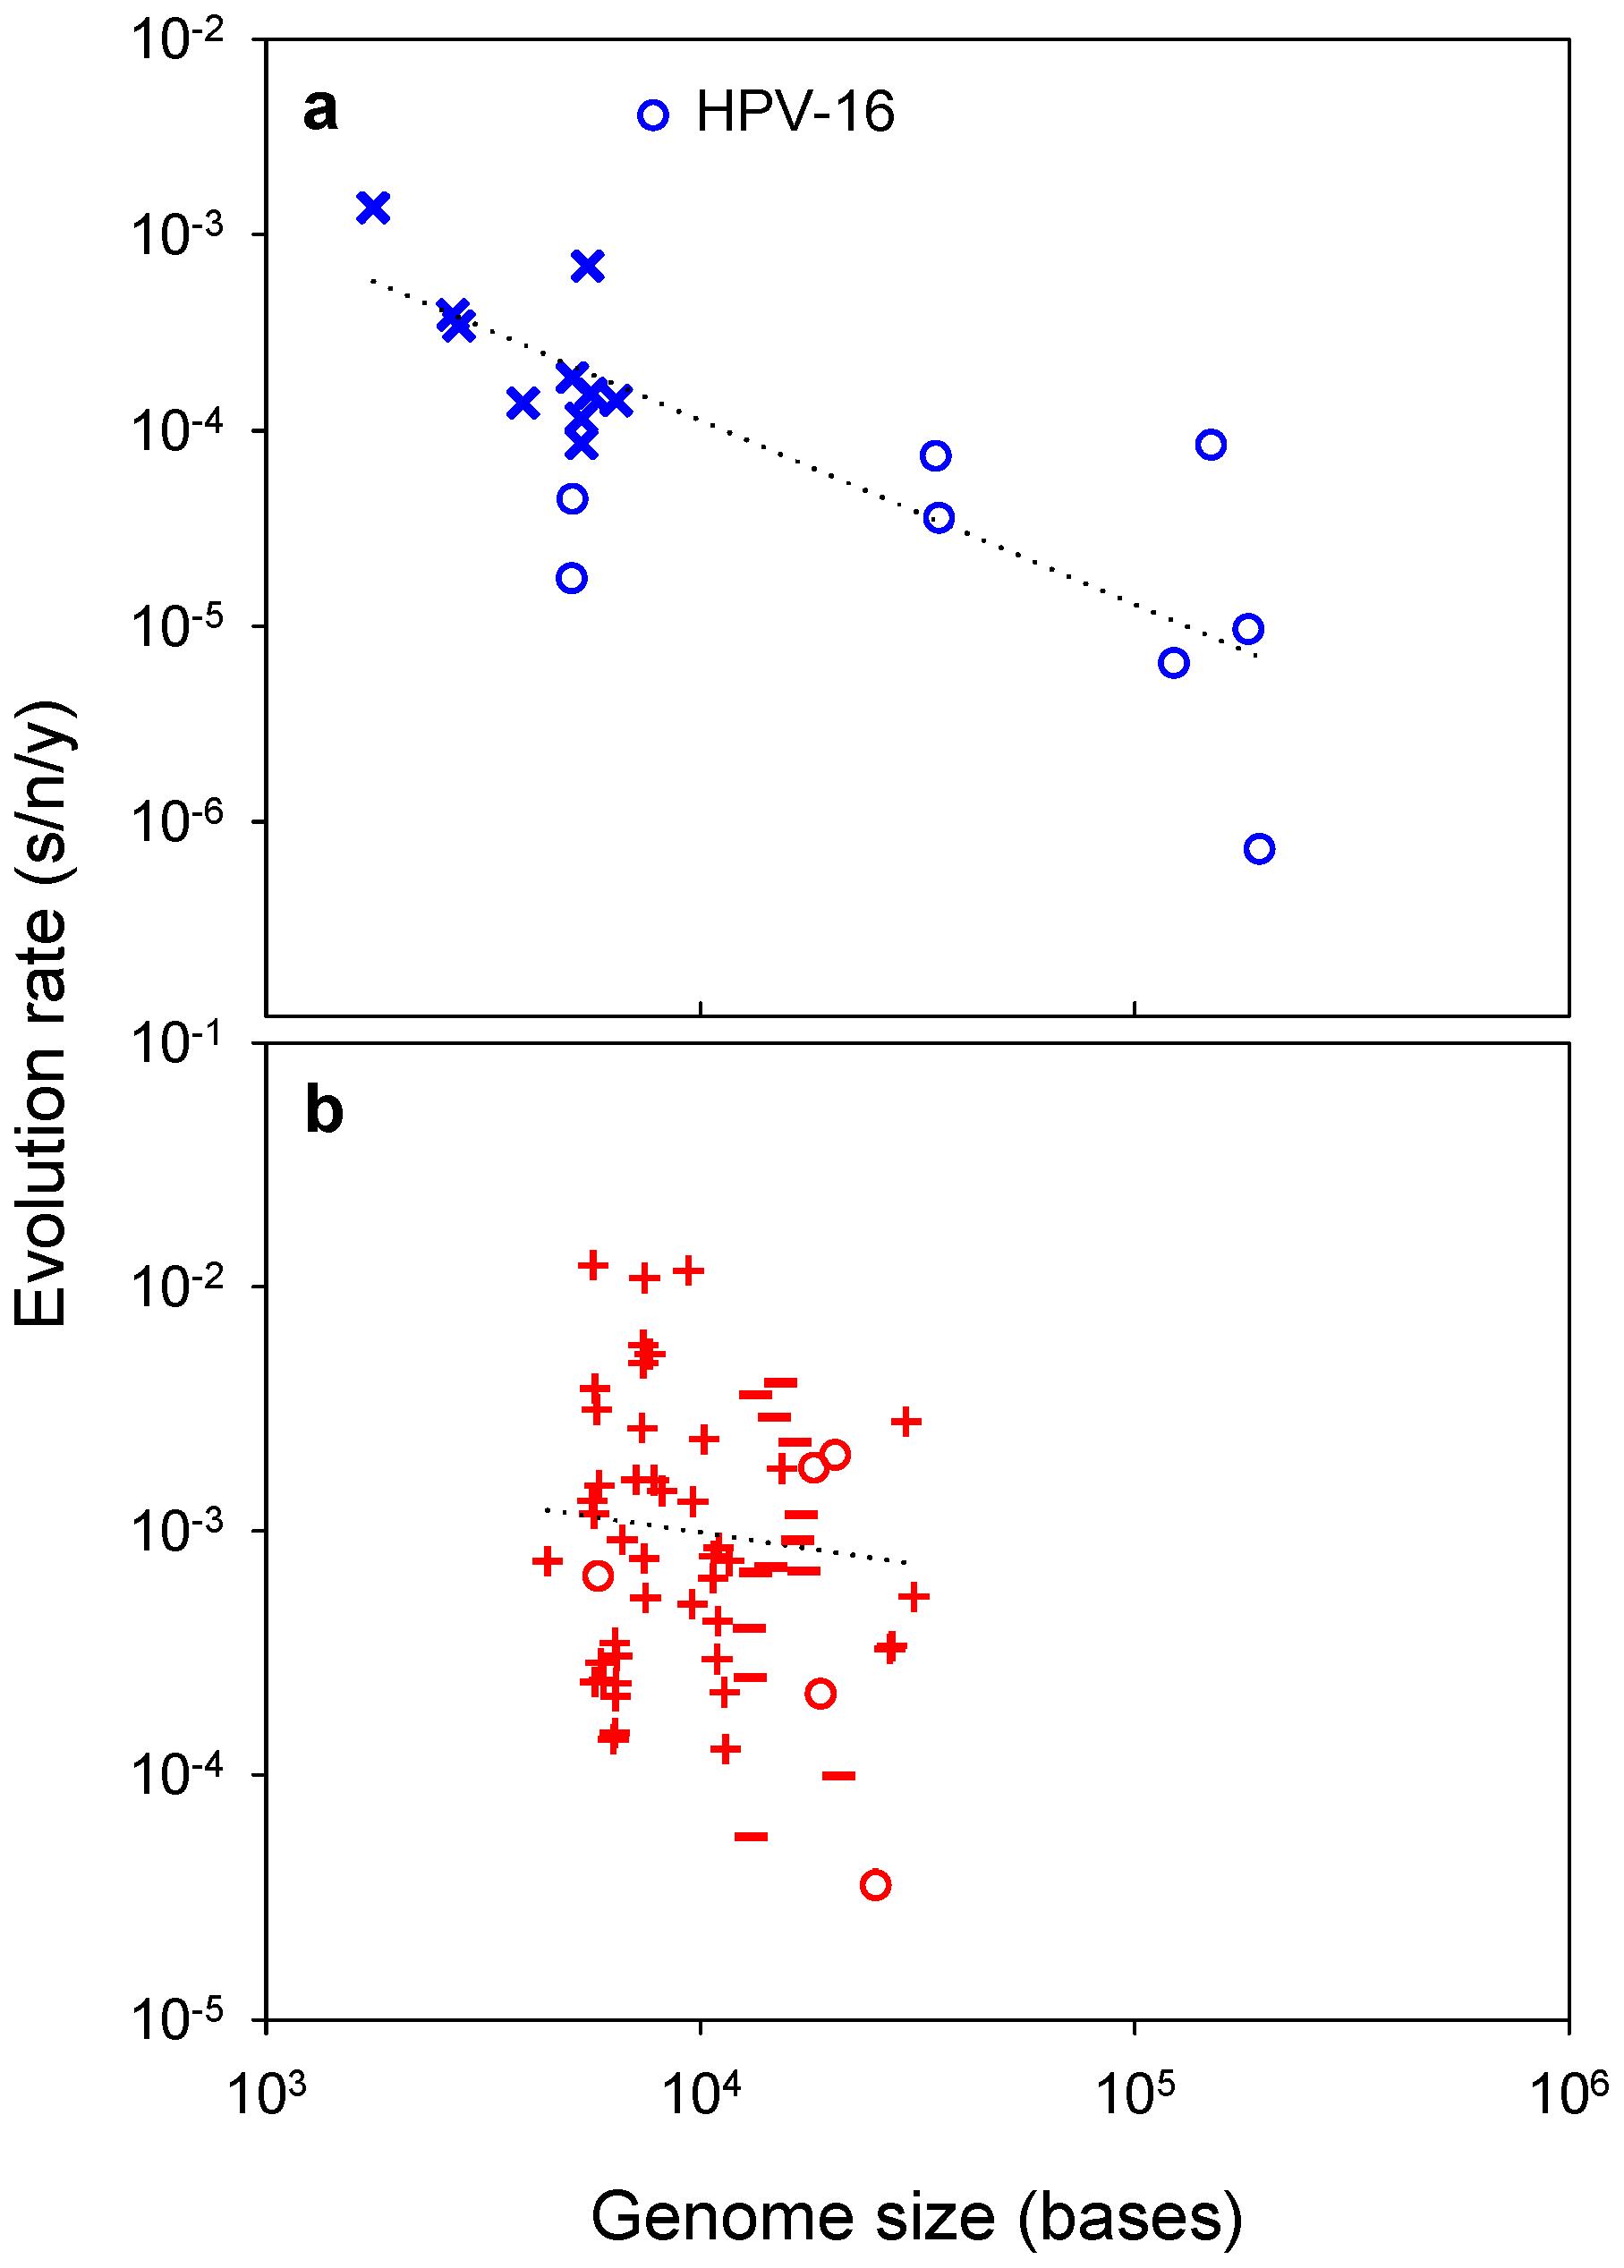 Viral evolution rate versus genome size.